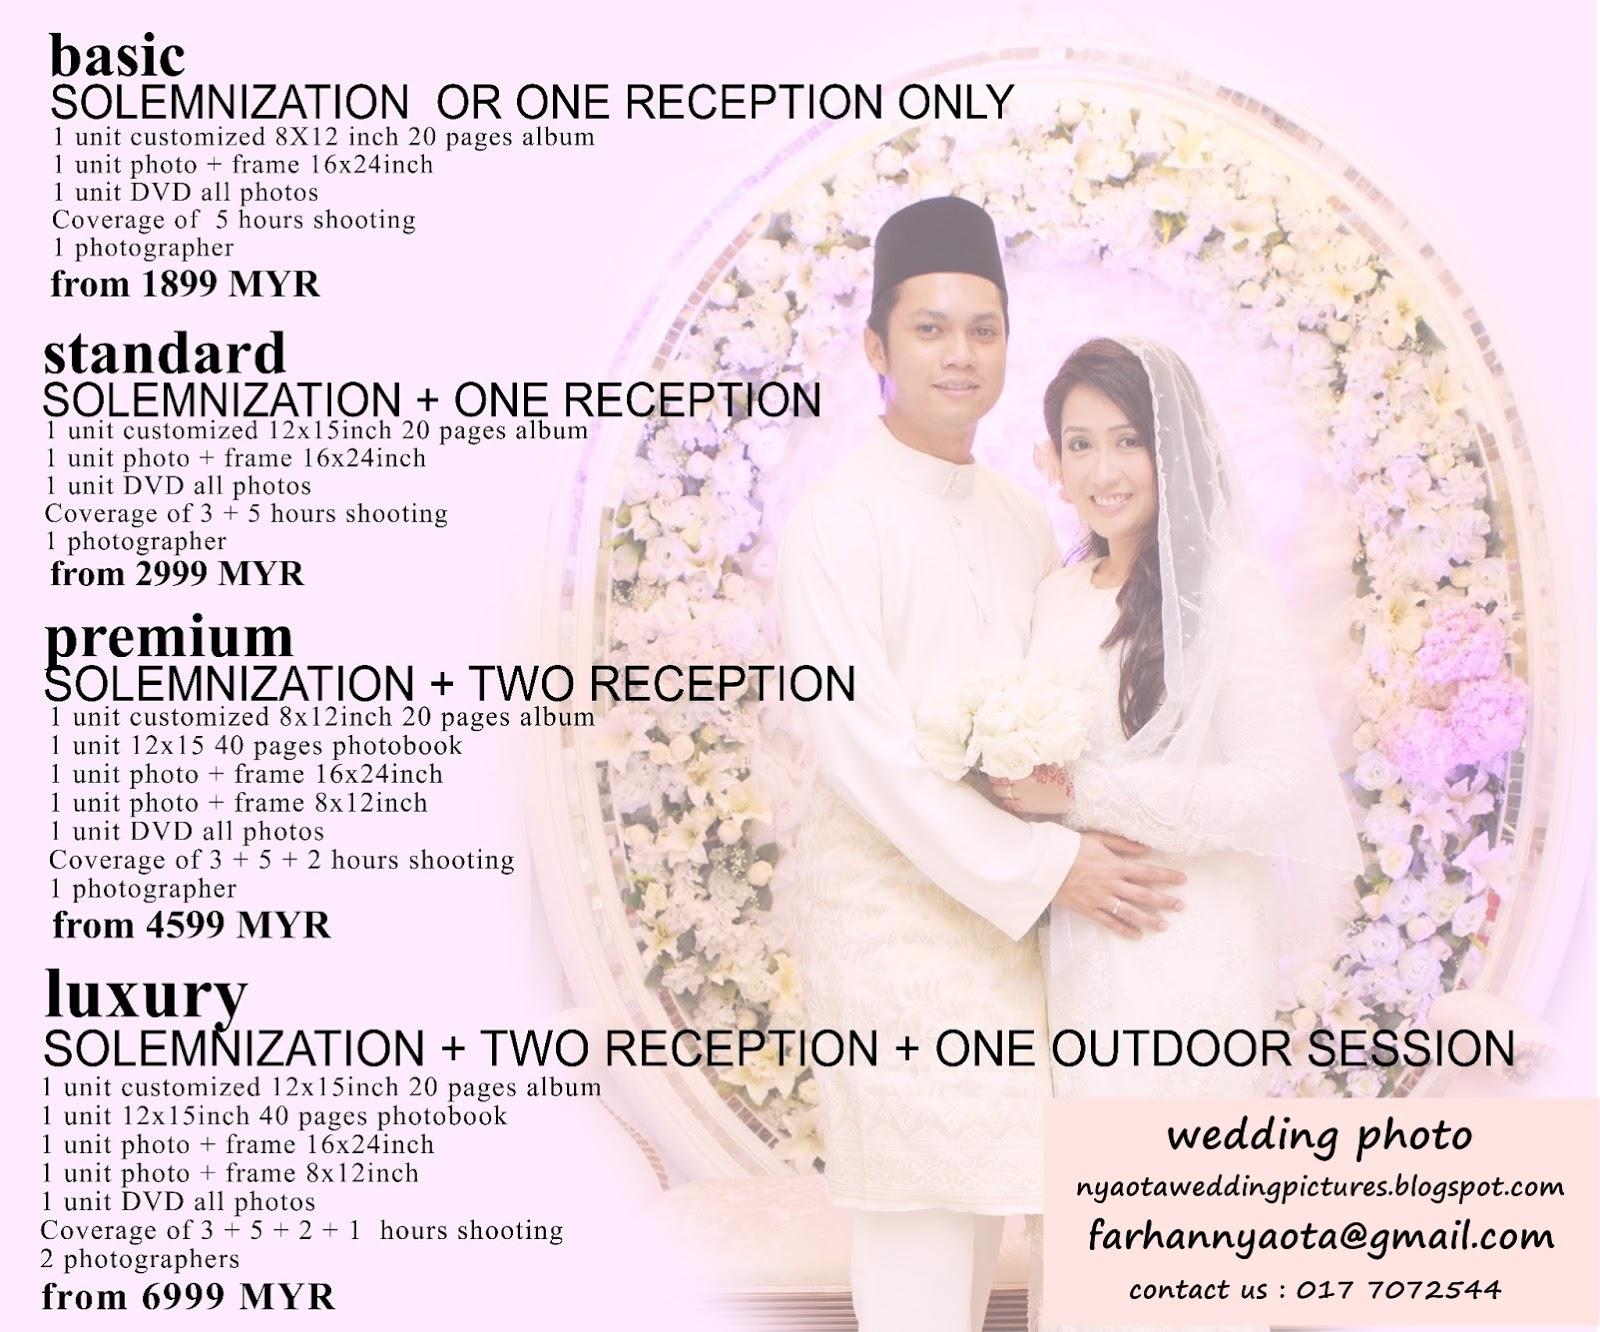 Wedding Photo Pre Package Price Malaysia